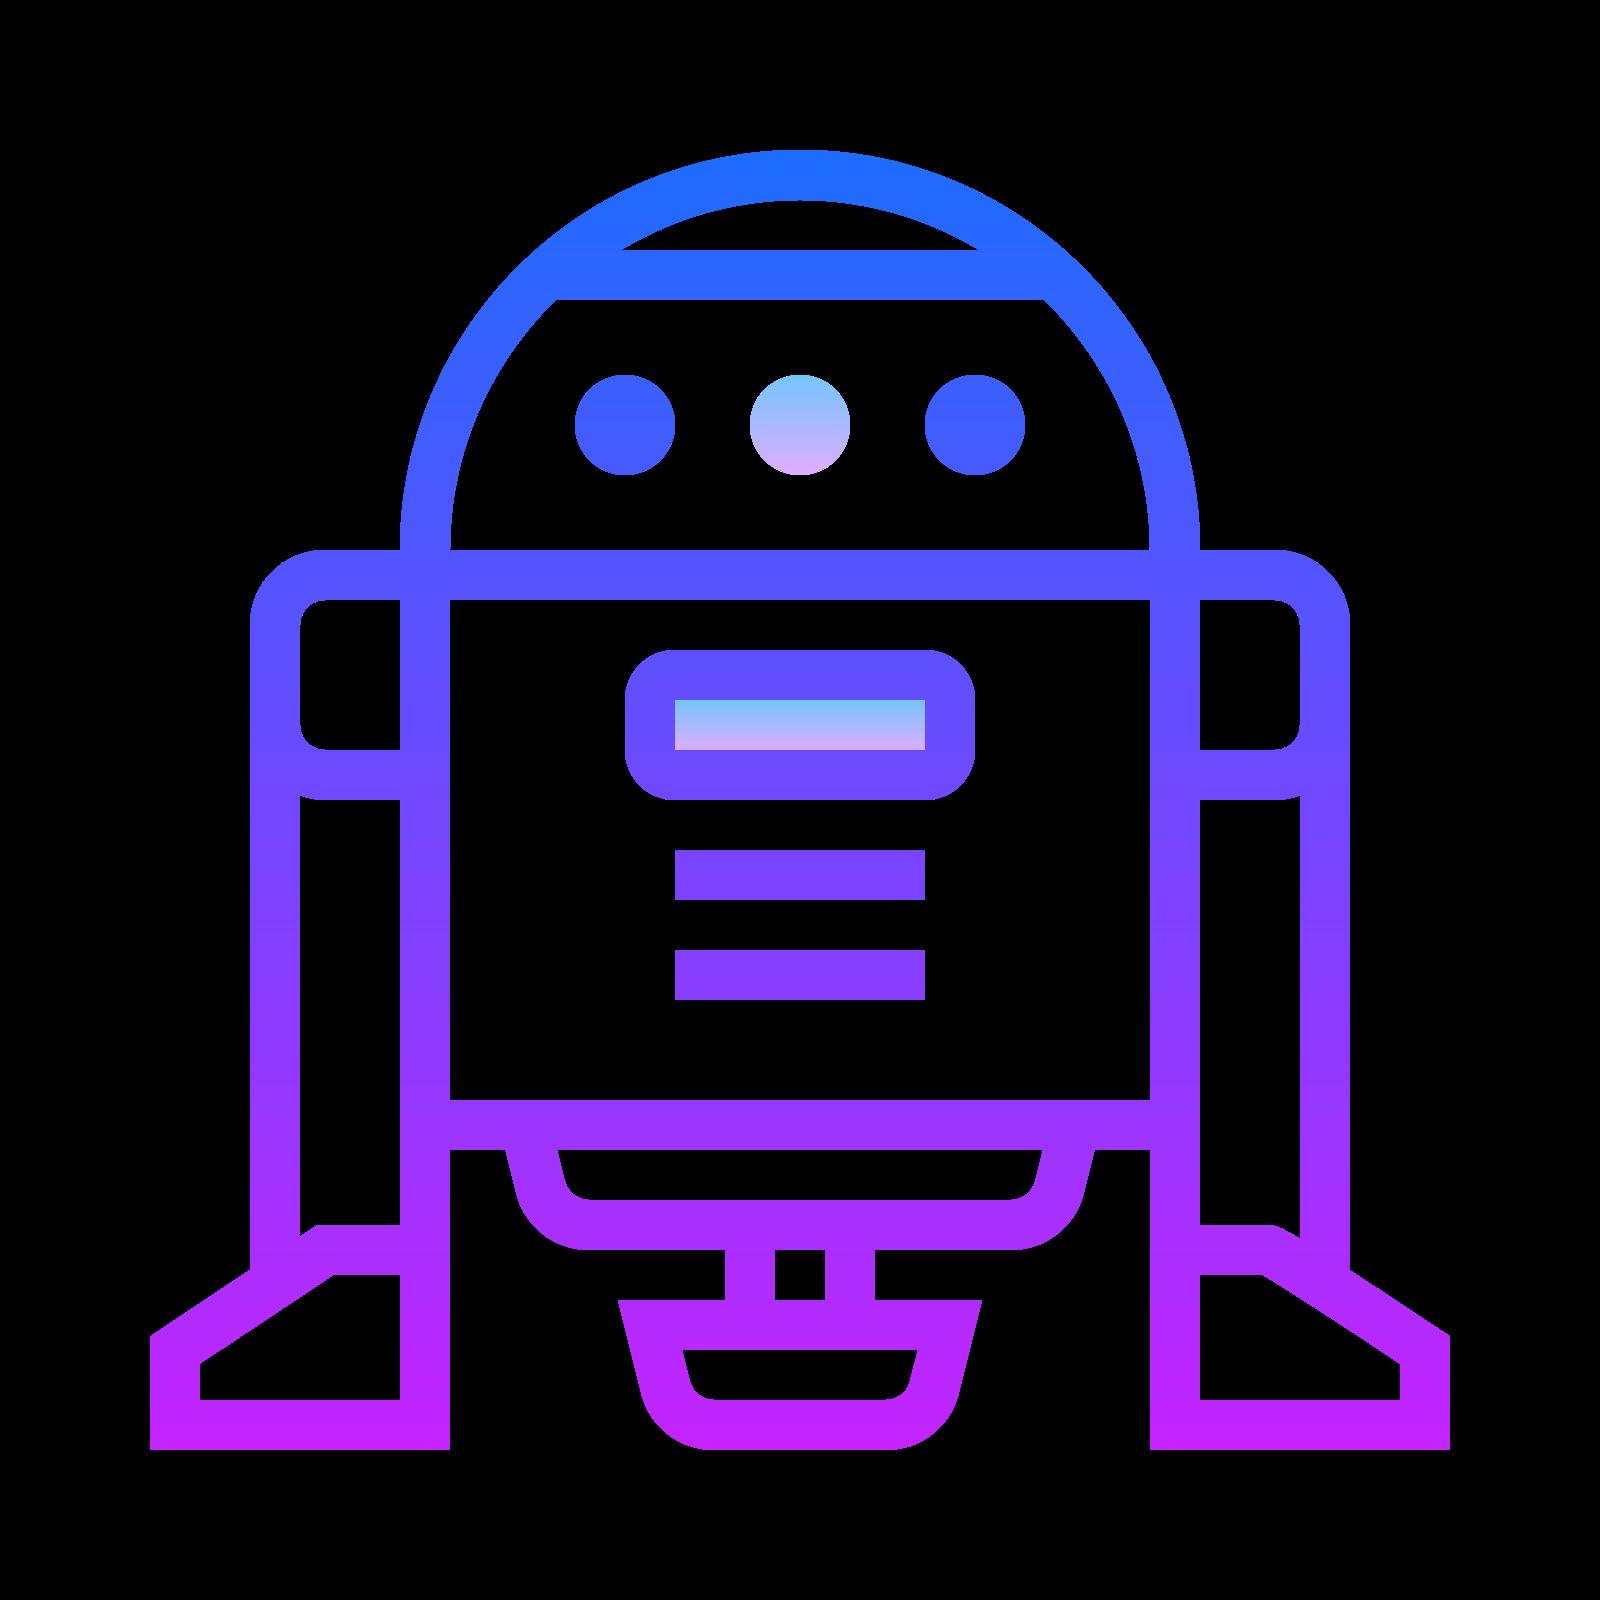 R2-D2 icon